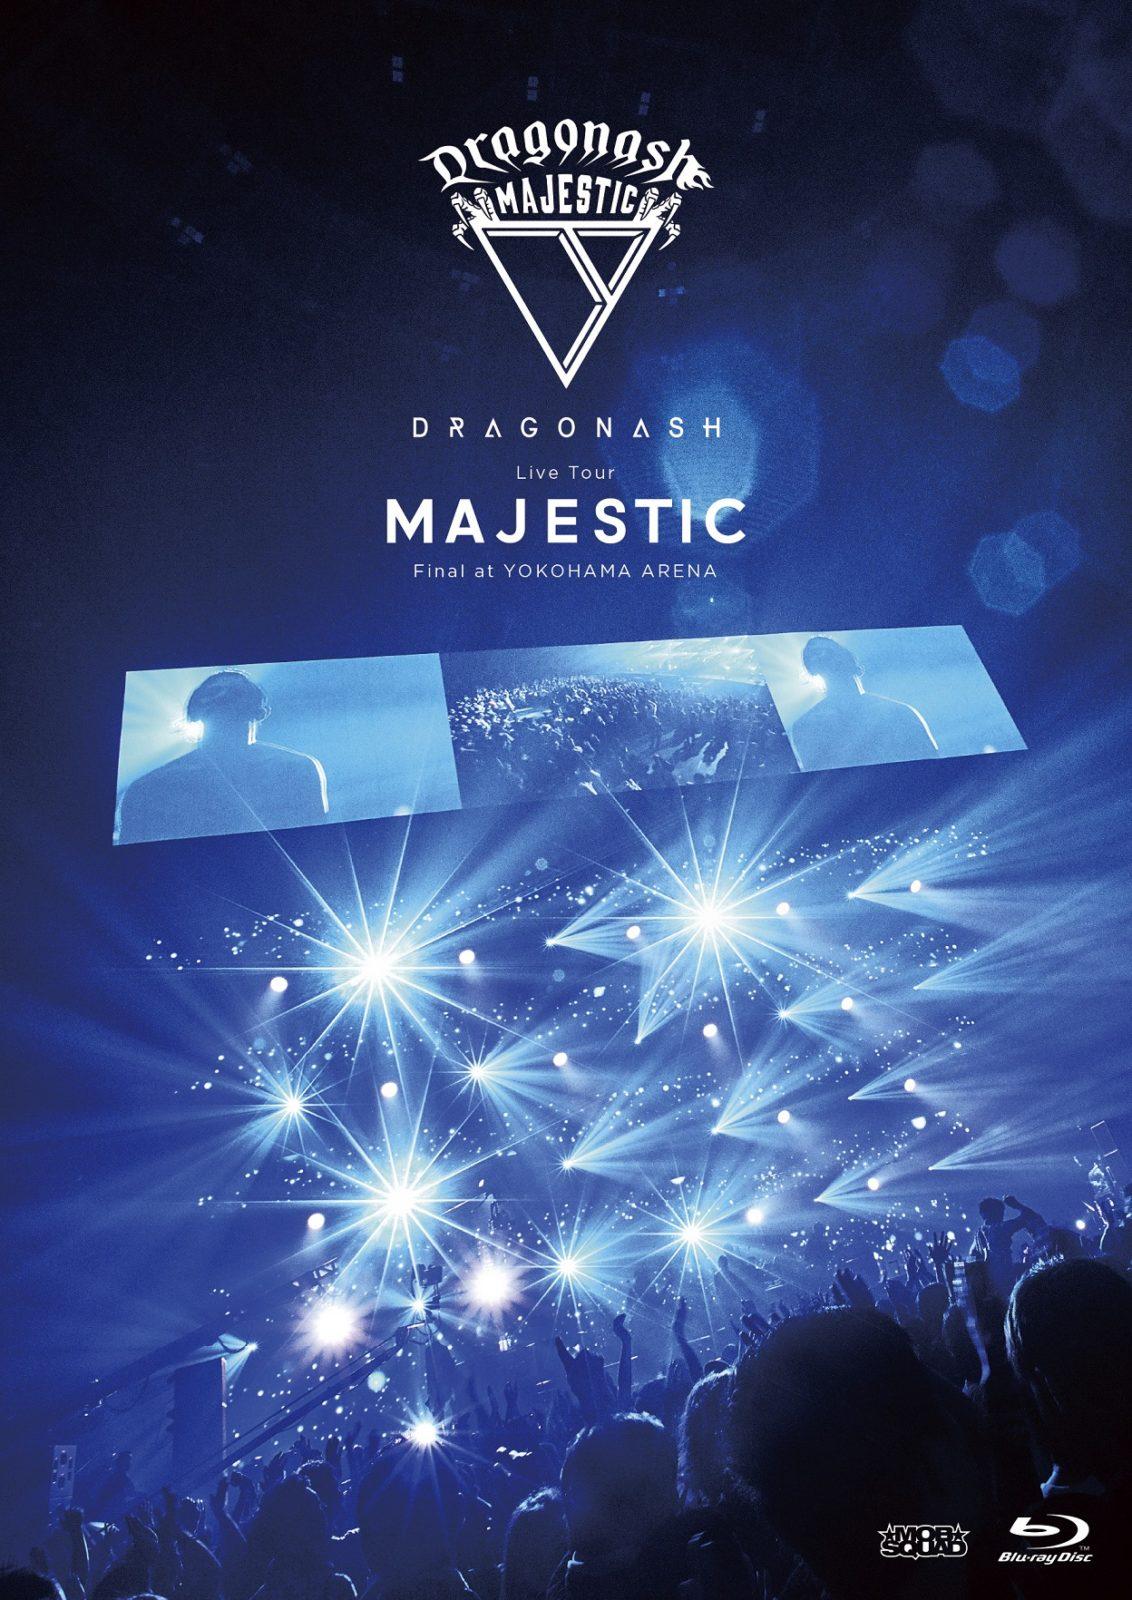 Dragon Ash 20周年イヤーファイナルを飾る映像作品「Live Tour MAJESTIC Final at YOKOHAMA ARENA」の全収録楽曲とジャケット写真を公開